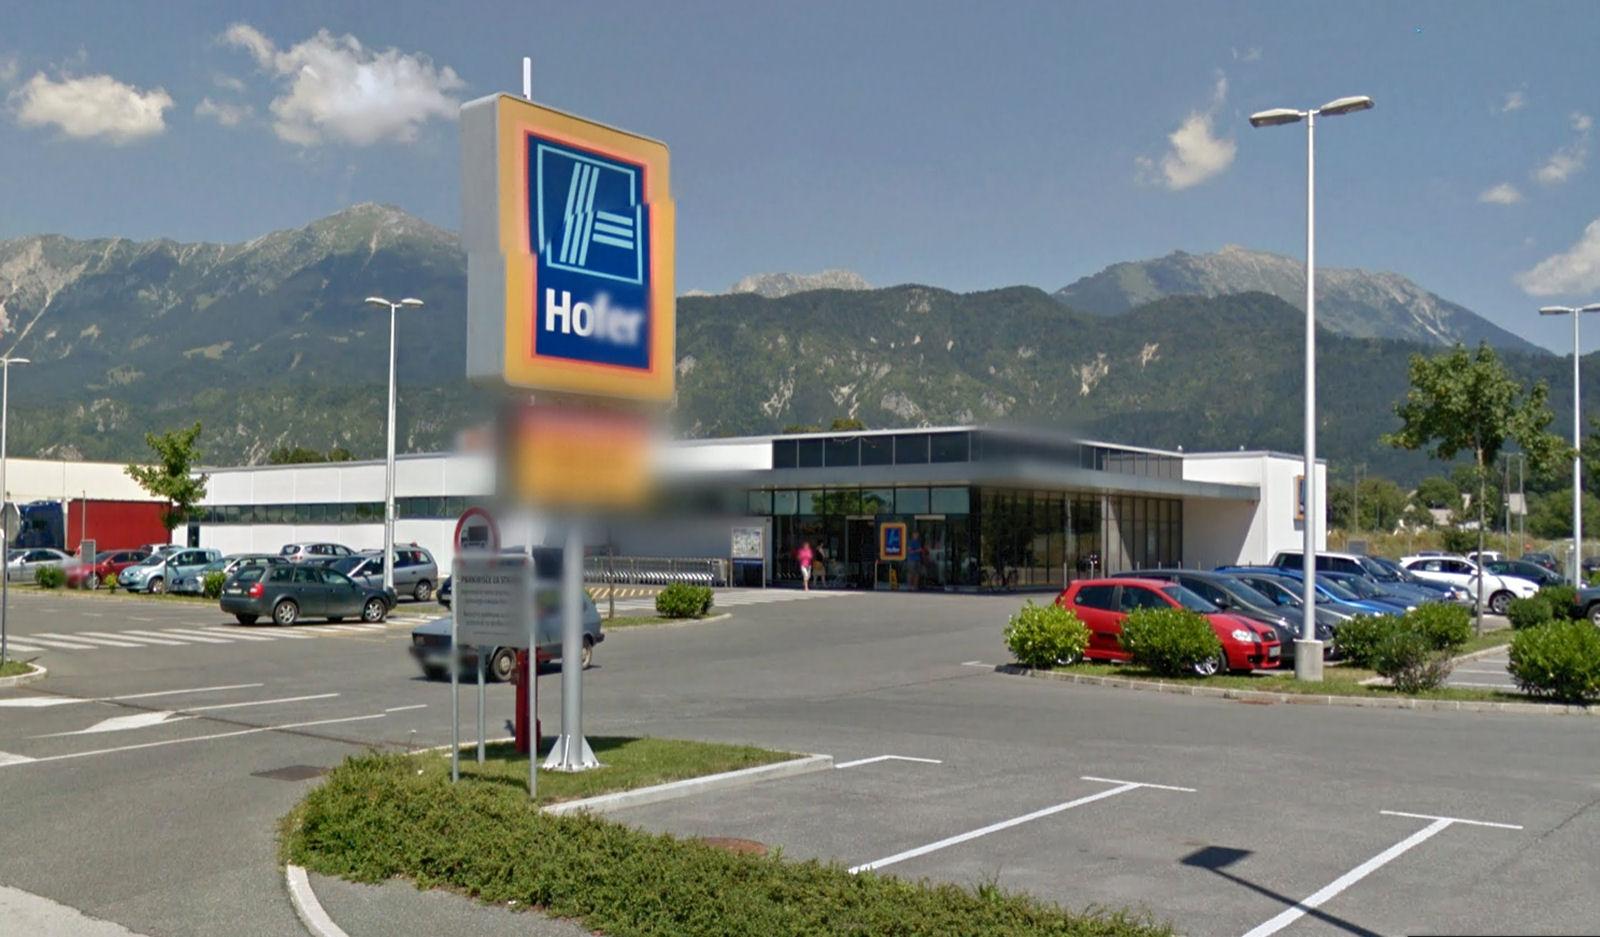 Hofer supermarket in Lesce, Slovenia